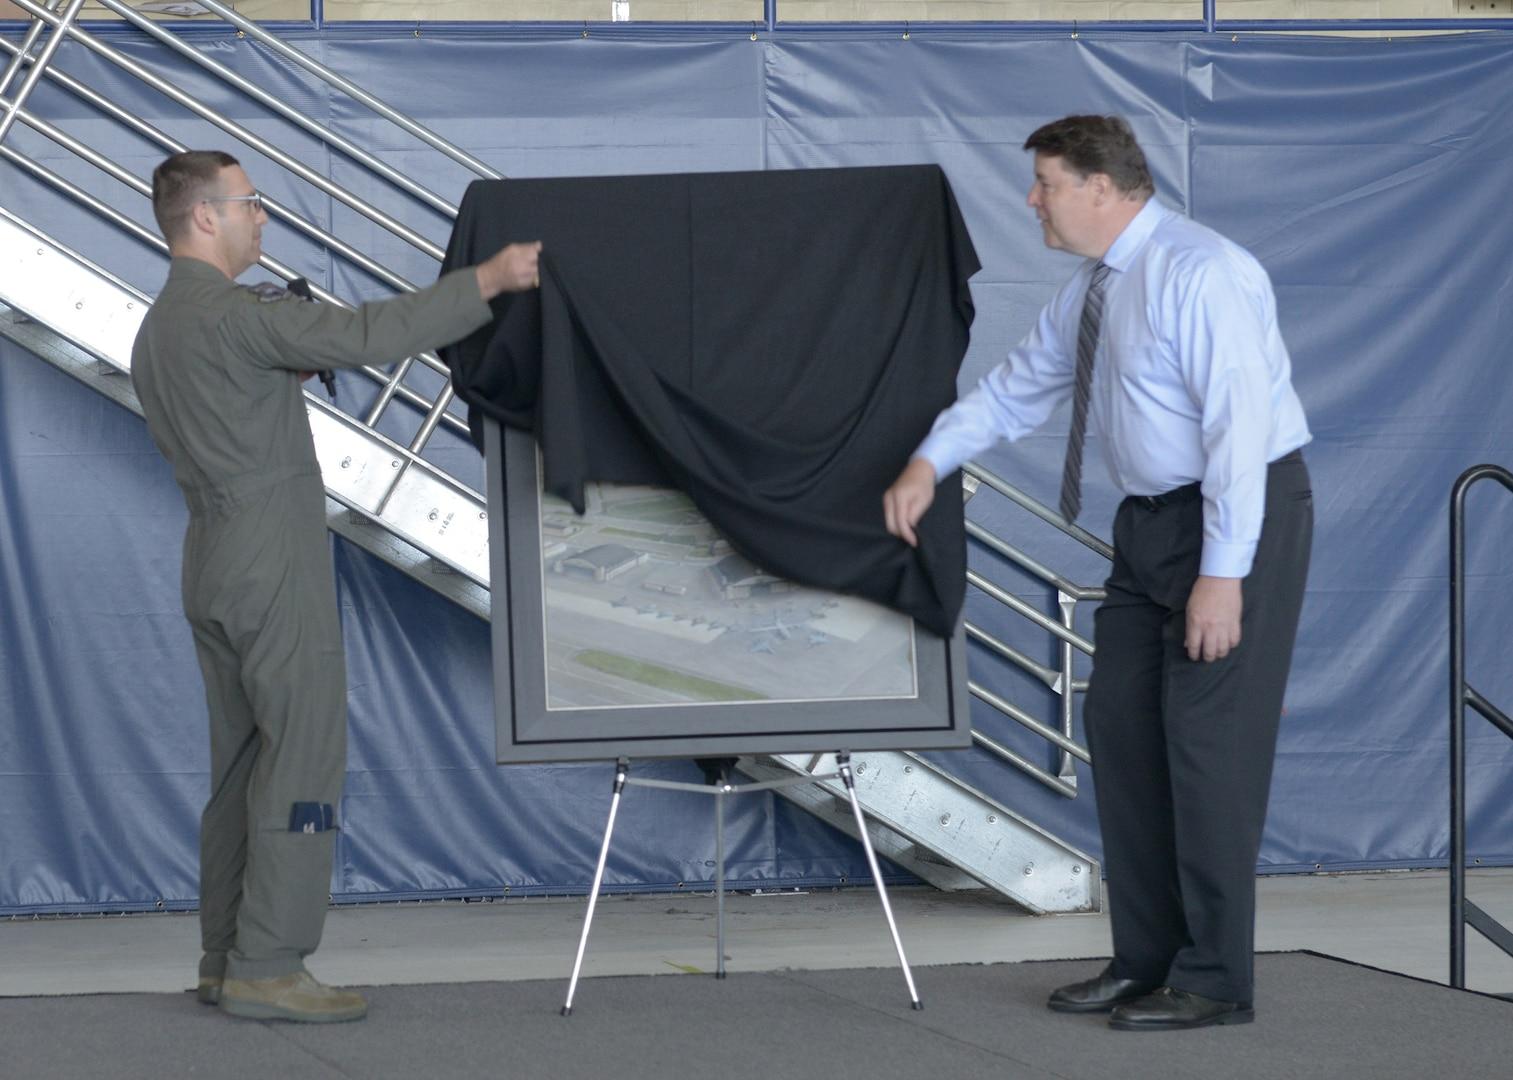 Joint Base Elmendorf-Richardson's 3rd Wing Celebrates 100th Anniversary